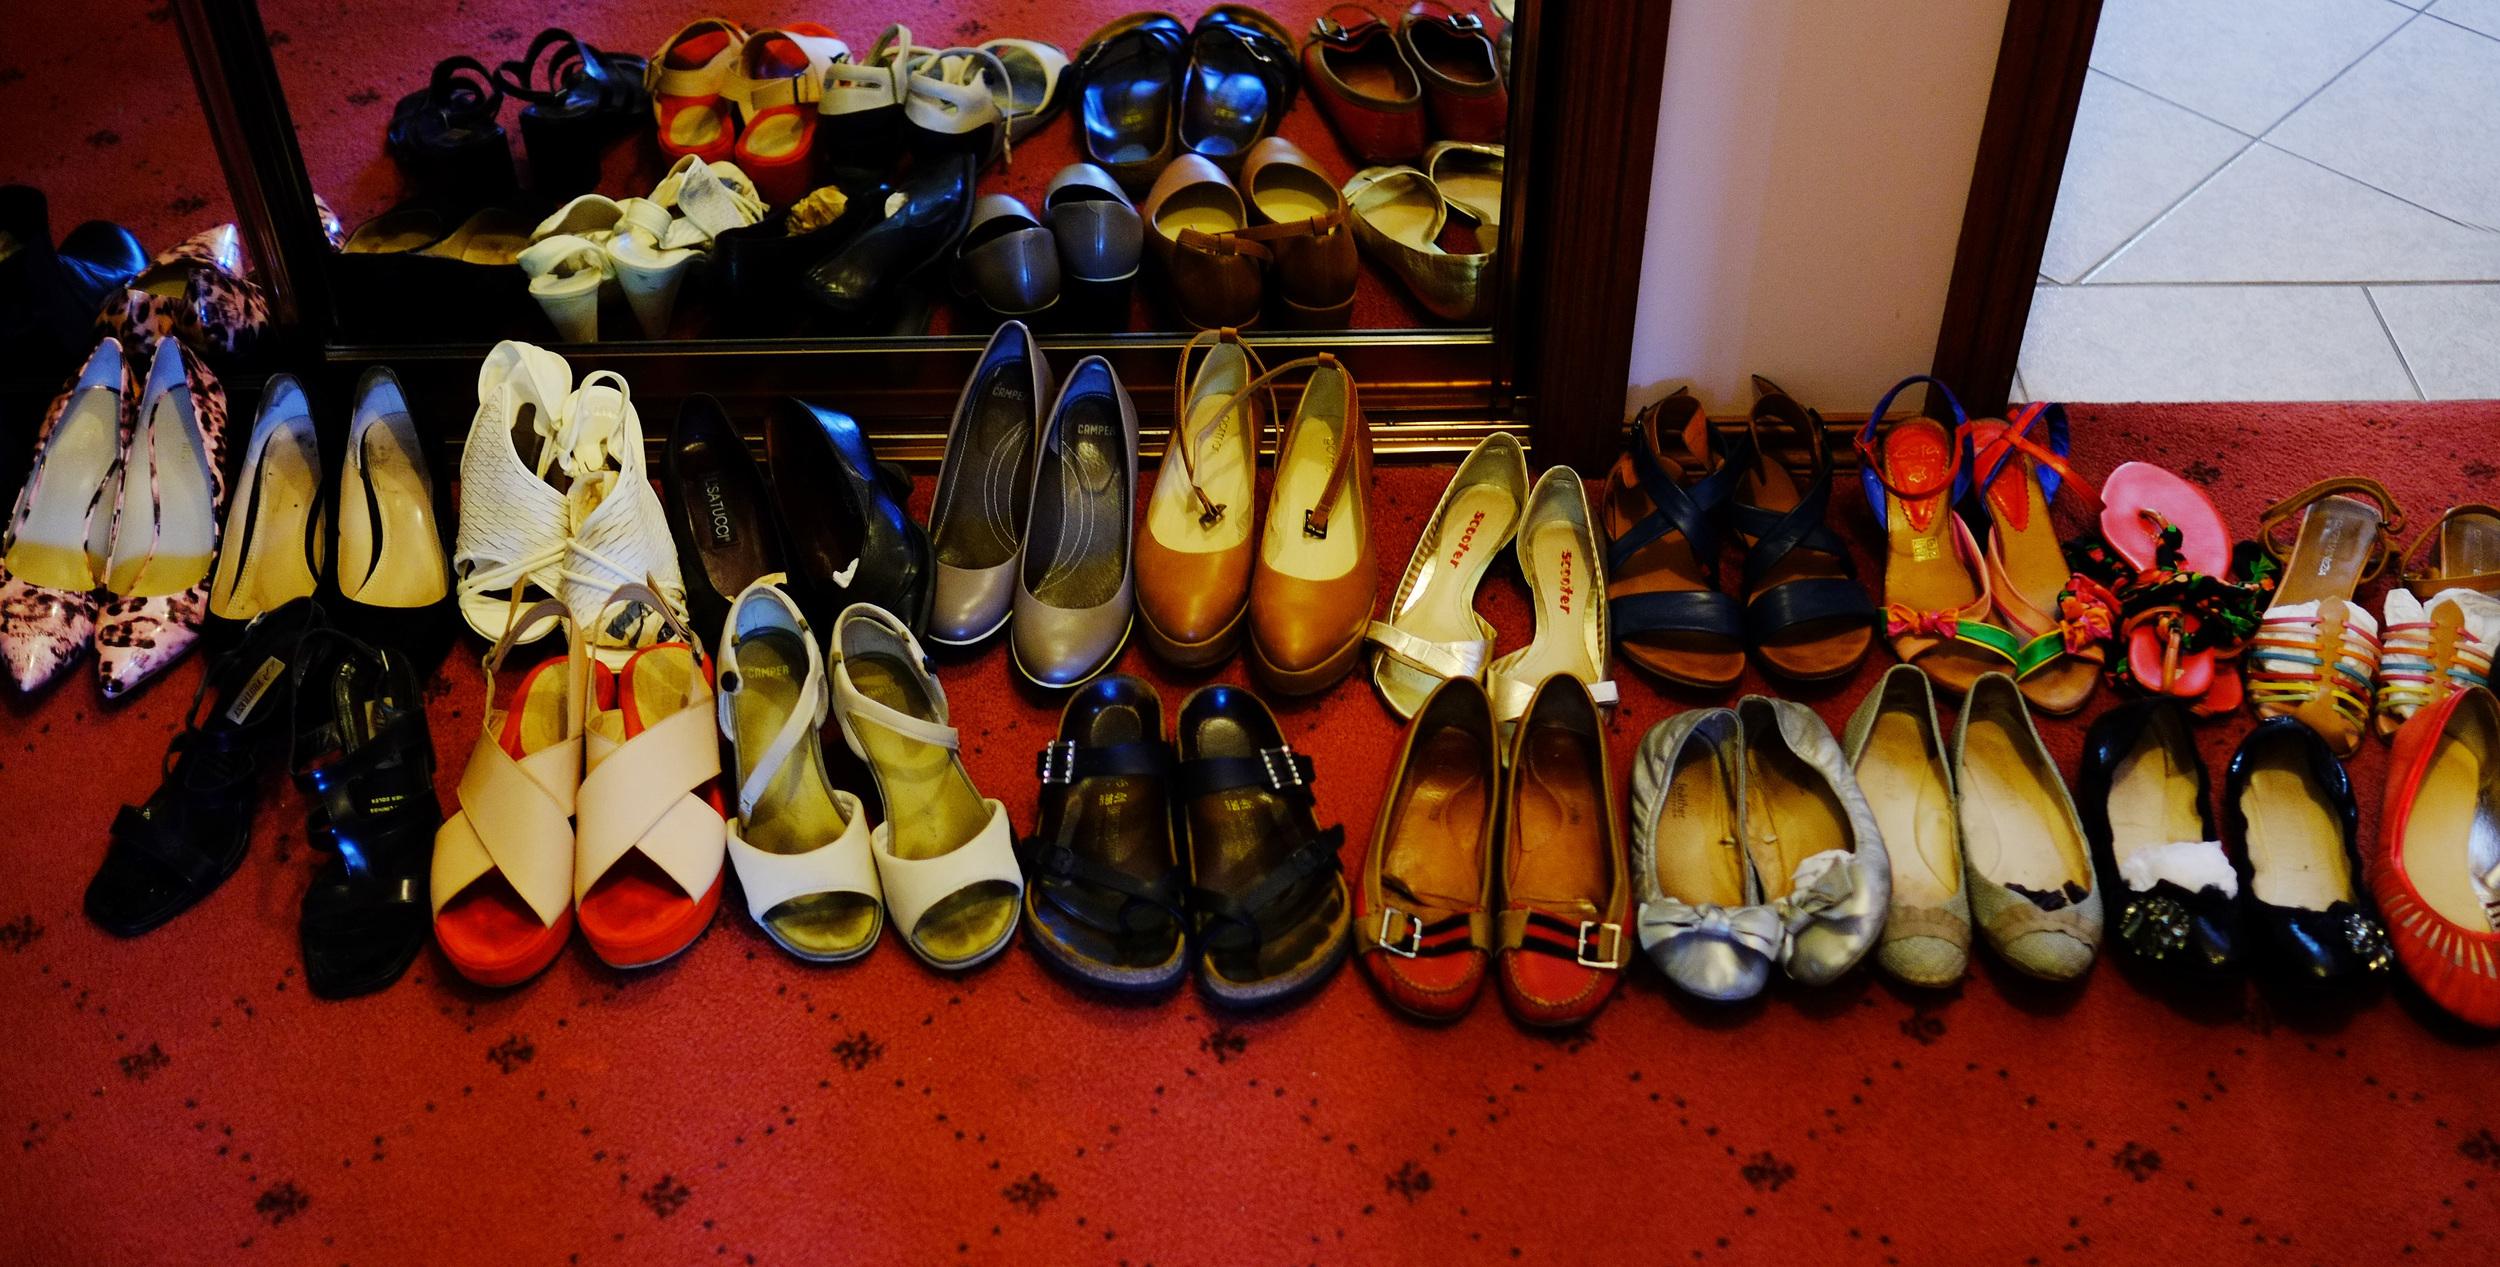 organising shoes